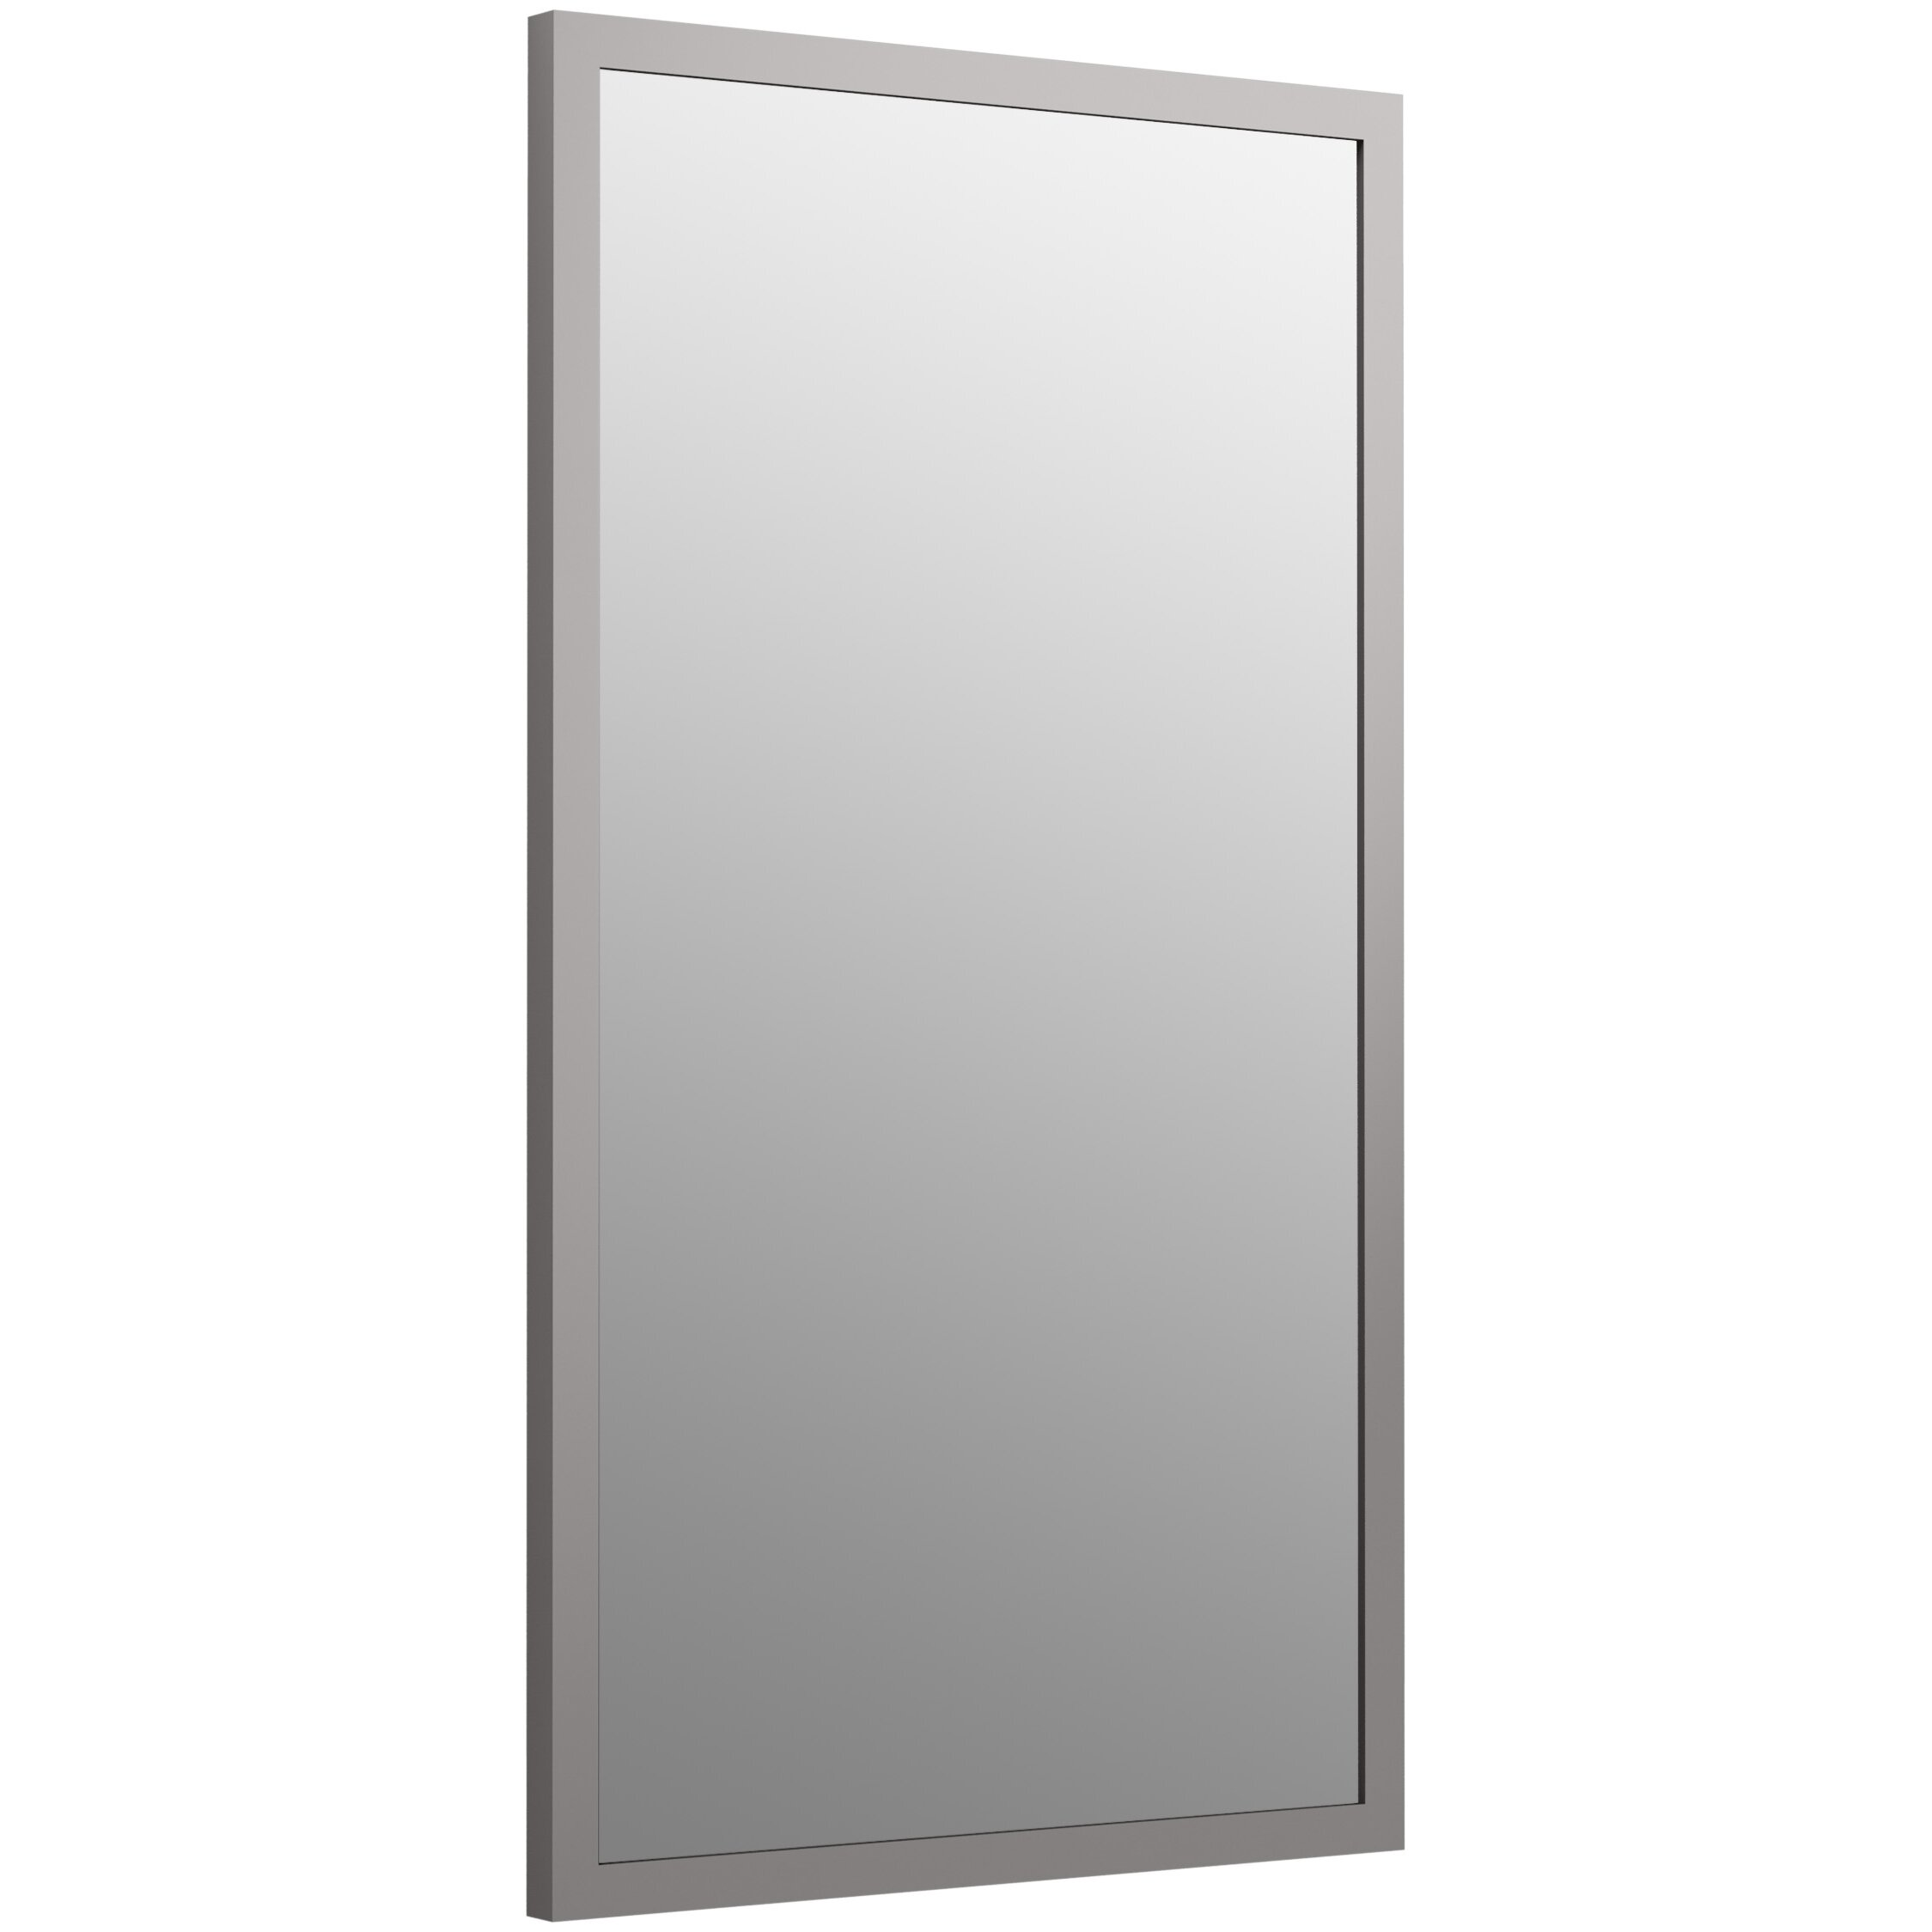 Perfect KOHLER Provinity 34in H X 28in W Vellum Rectangular Bathroom Mirror